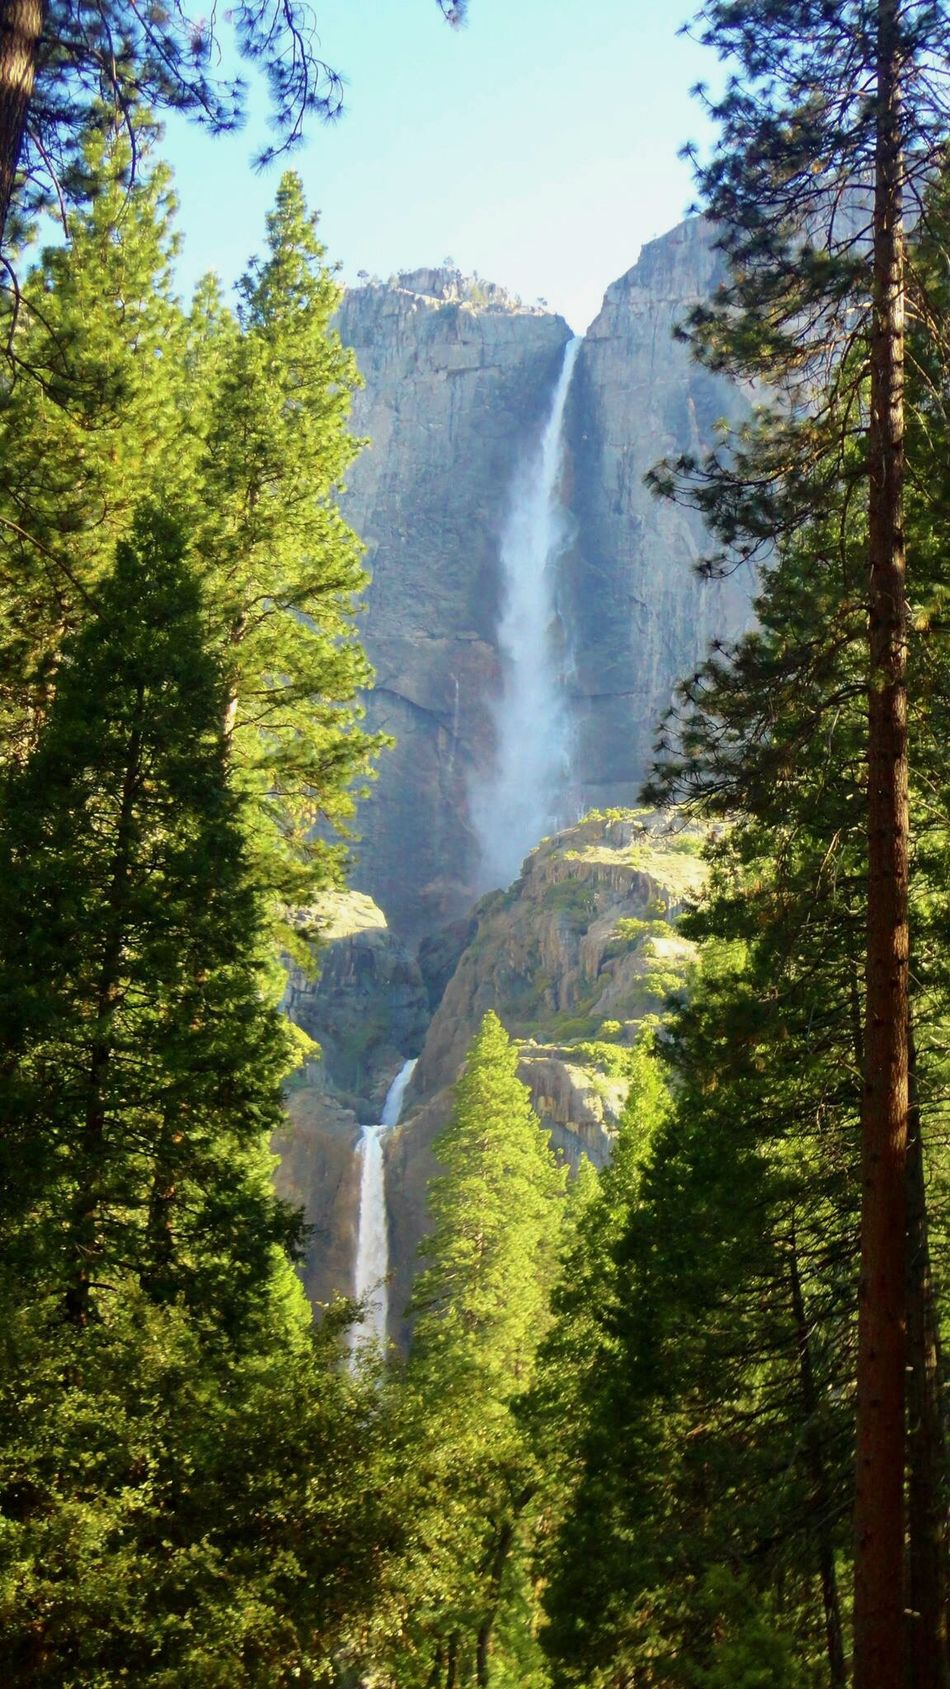 USA Yosemite National Park Yosemite Fall Landscape America Waterfall_collection UNESCO World Heritage Site Yosemite California High Looking Up Spectacular EyeEm Best Shots United States Wonderful Day Worldwide_shot Waterfall California Love Yosemite Falls Yosemitenationalpark ヨセミテ国立公園 アメリカ 滝 カリフォルニア 世界遺産